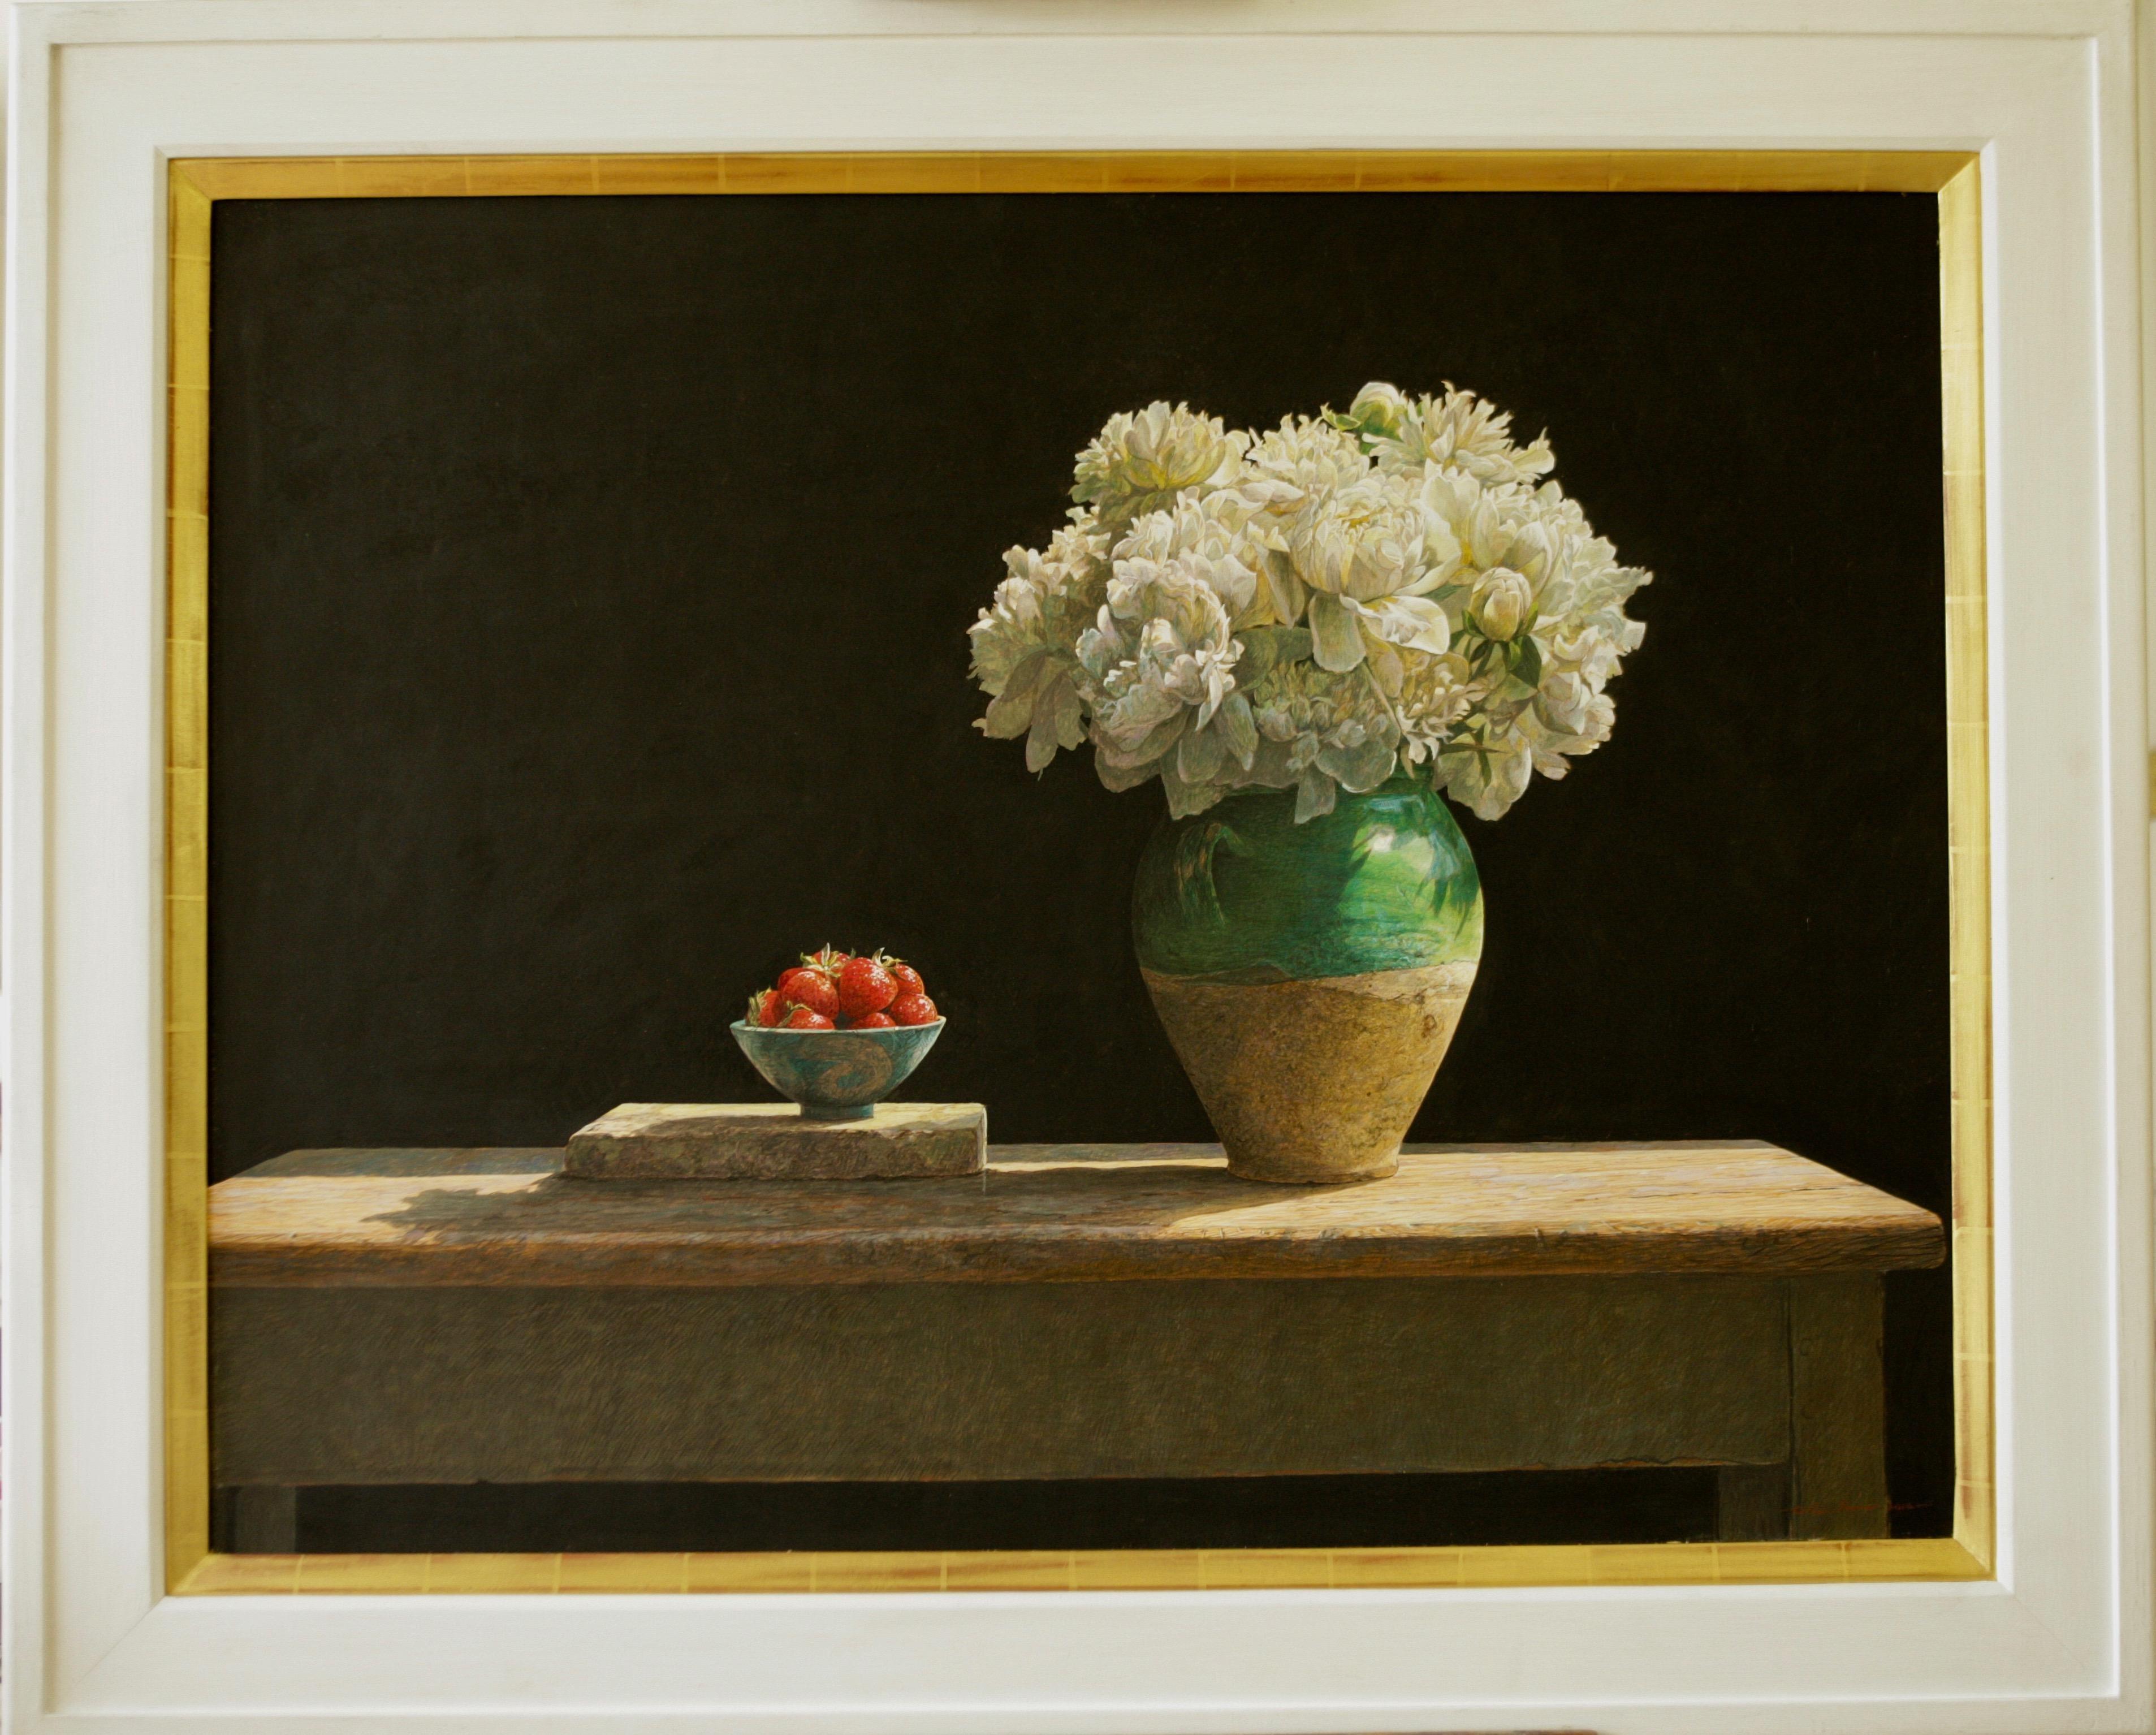 SOLSTICE Colin Fraser Still Life Realist Flowers Fruit Vase Painting Framed